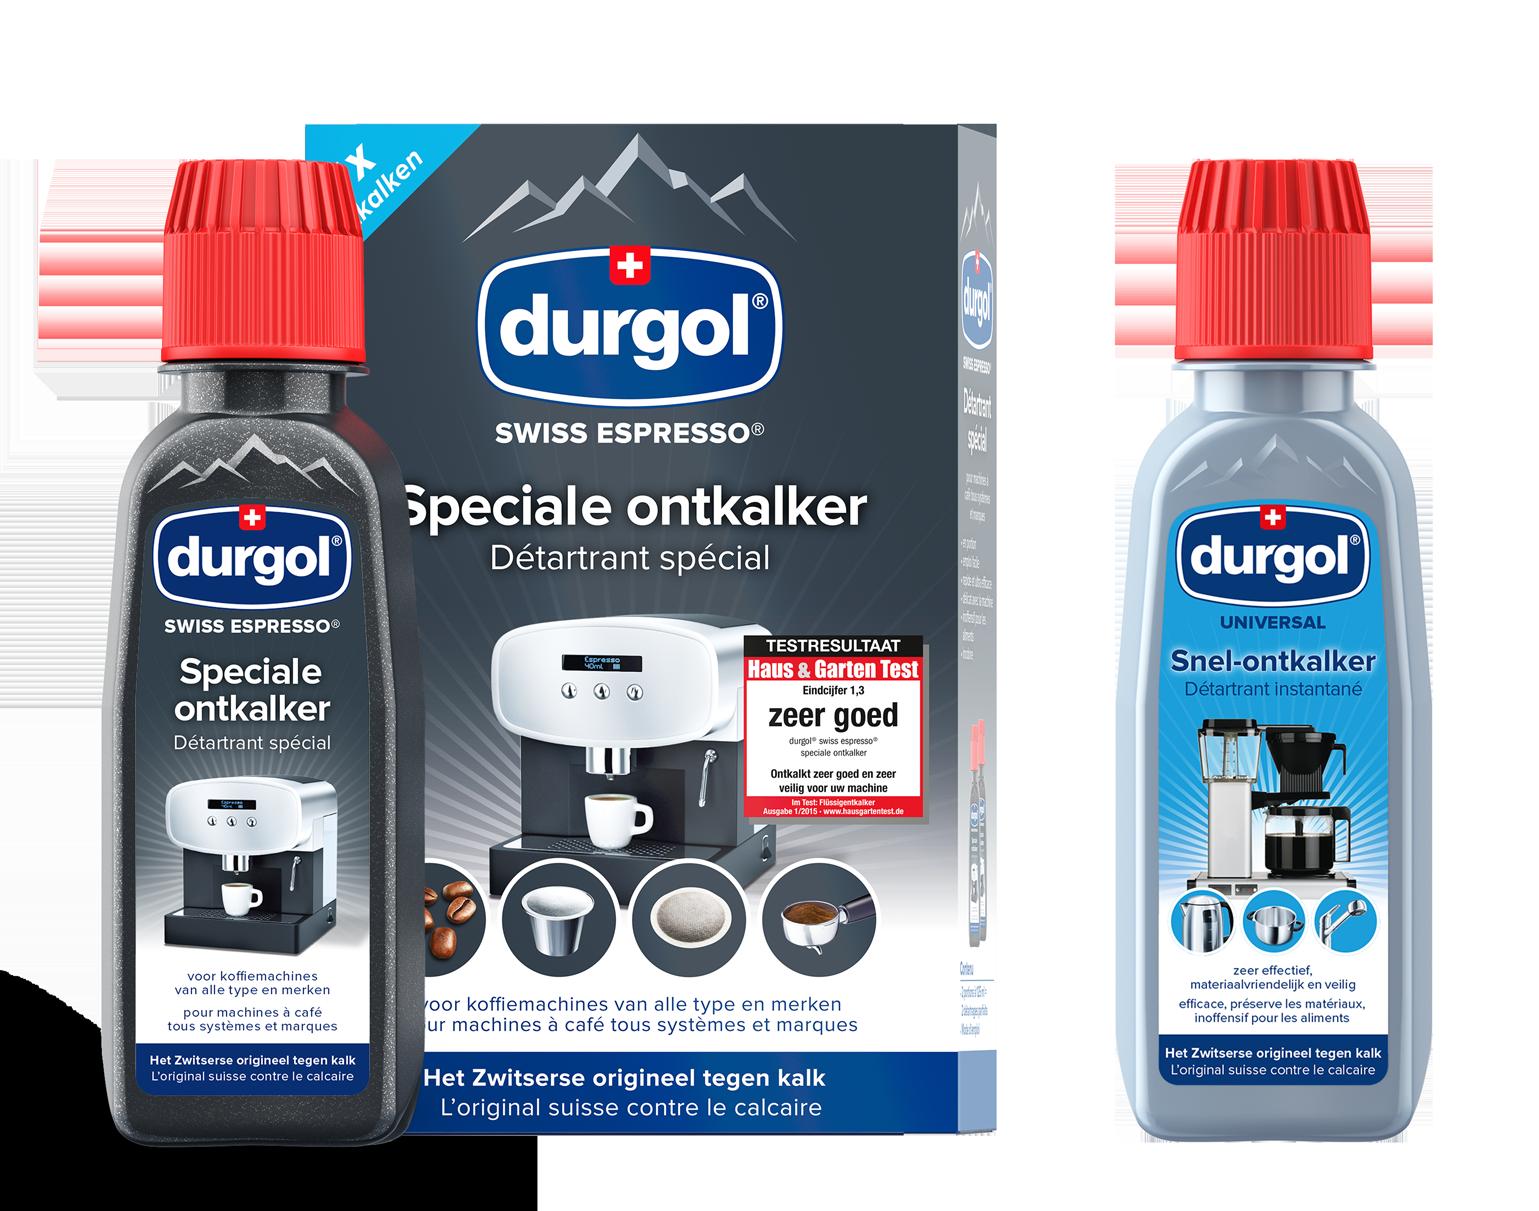 durgol swiss espresso en durgol universal proefmonster flesjes